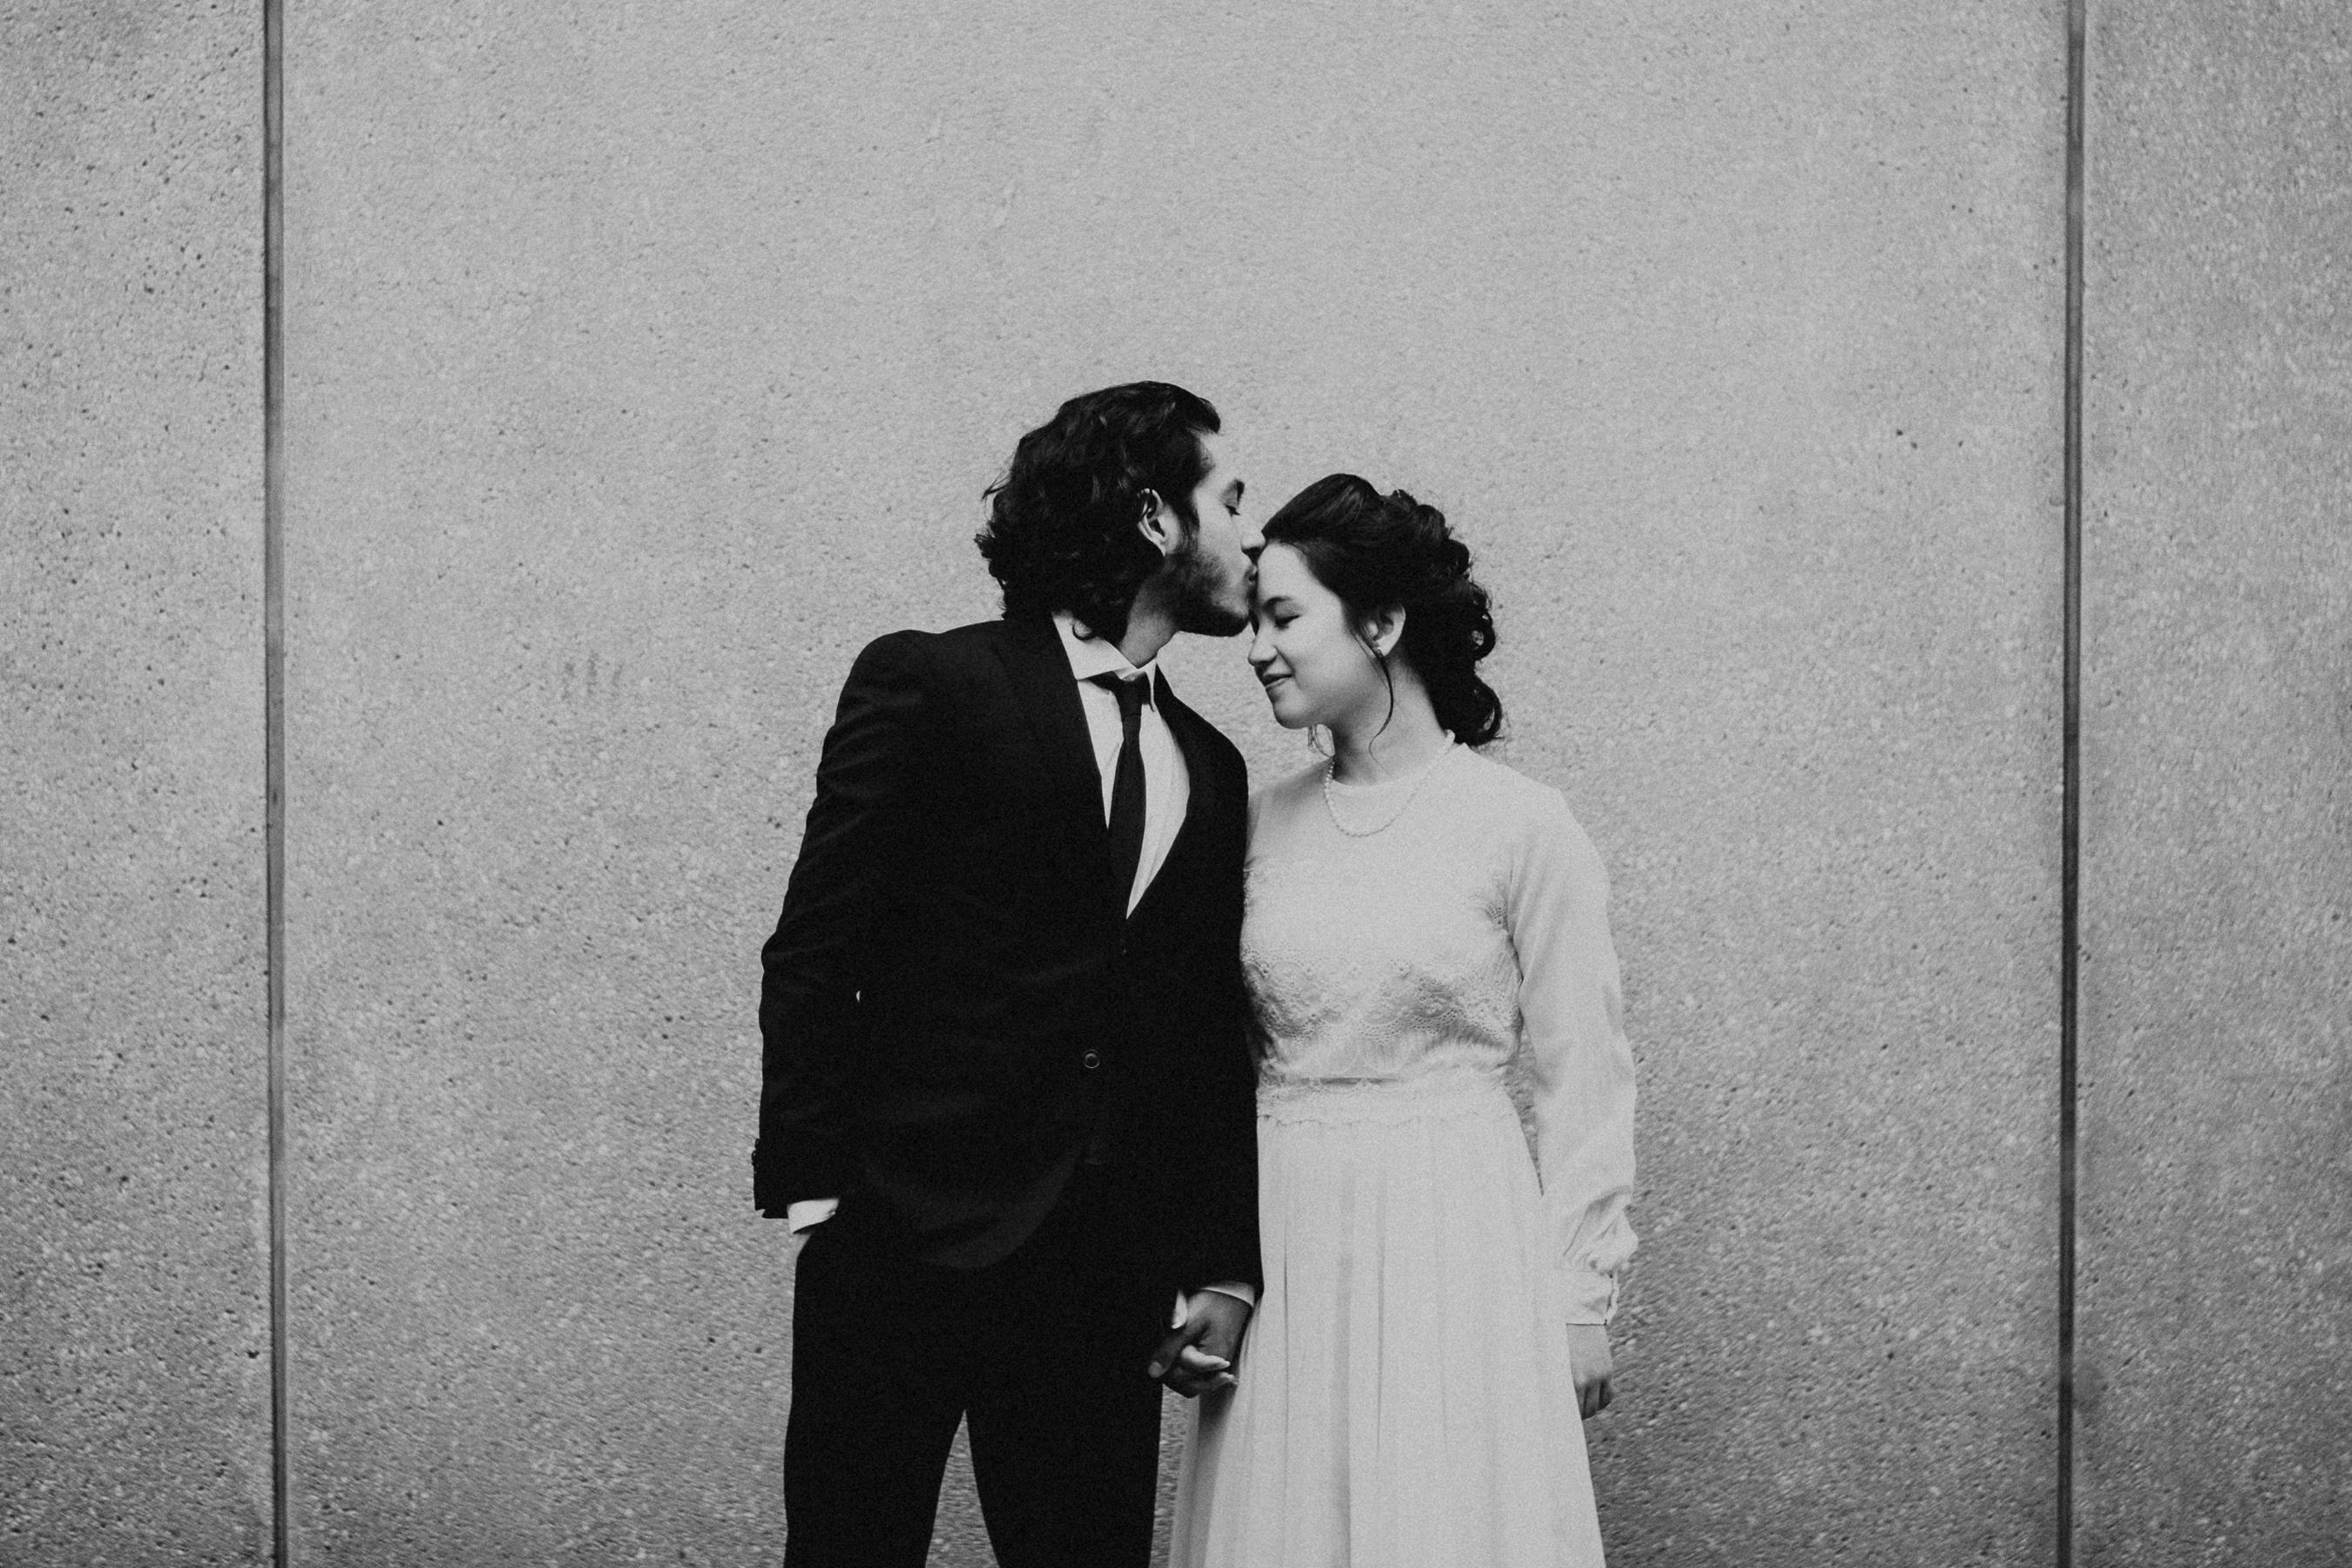 U of T Campus Wedding Photoshoot   Toronto 1 Avangard Photography Toronto Wedding Photographer